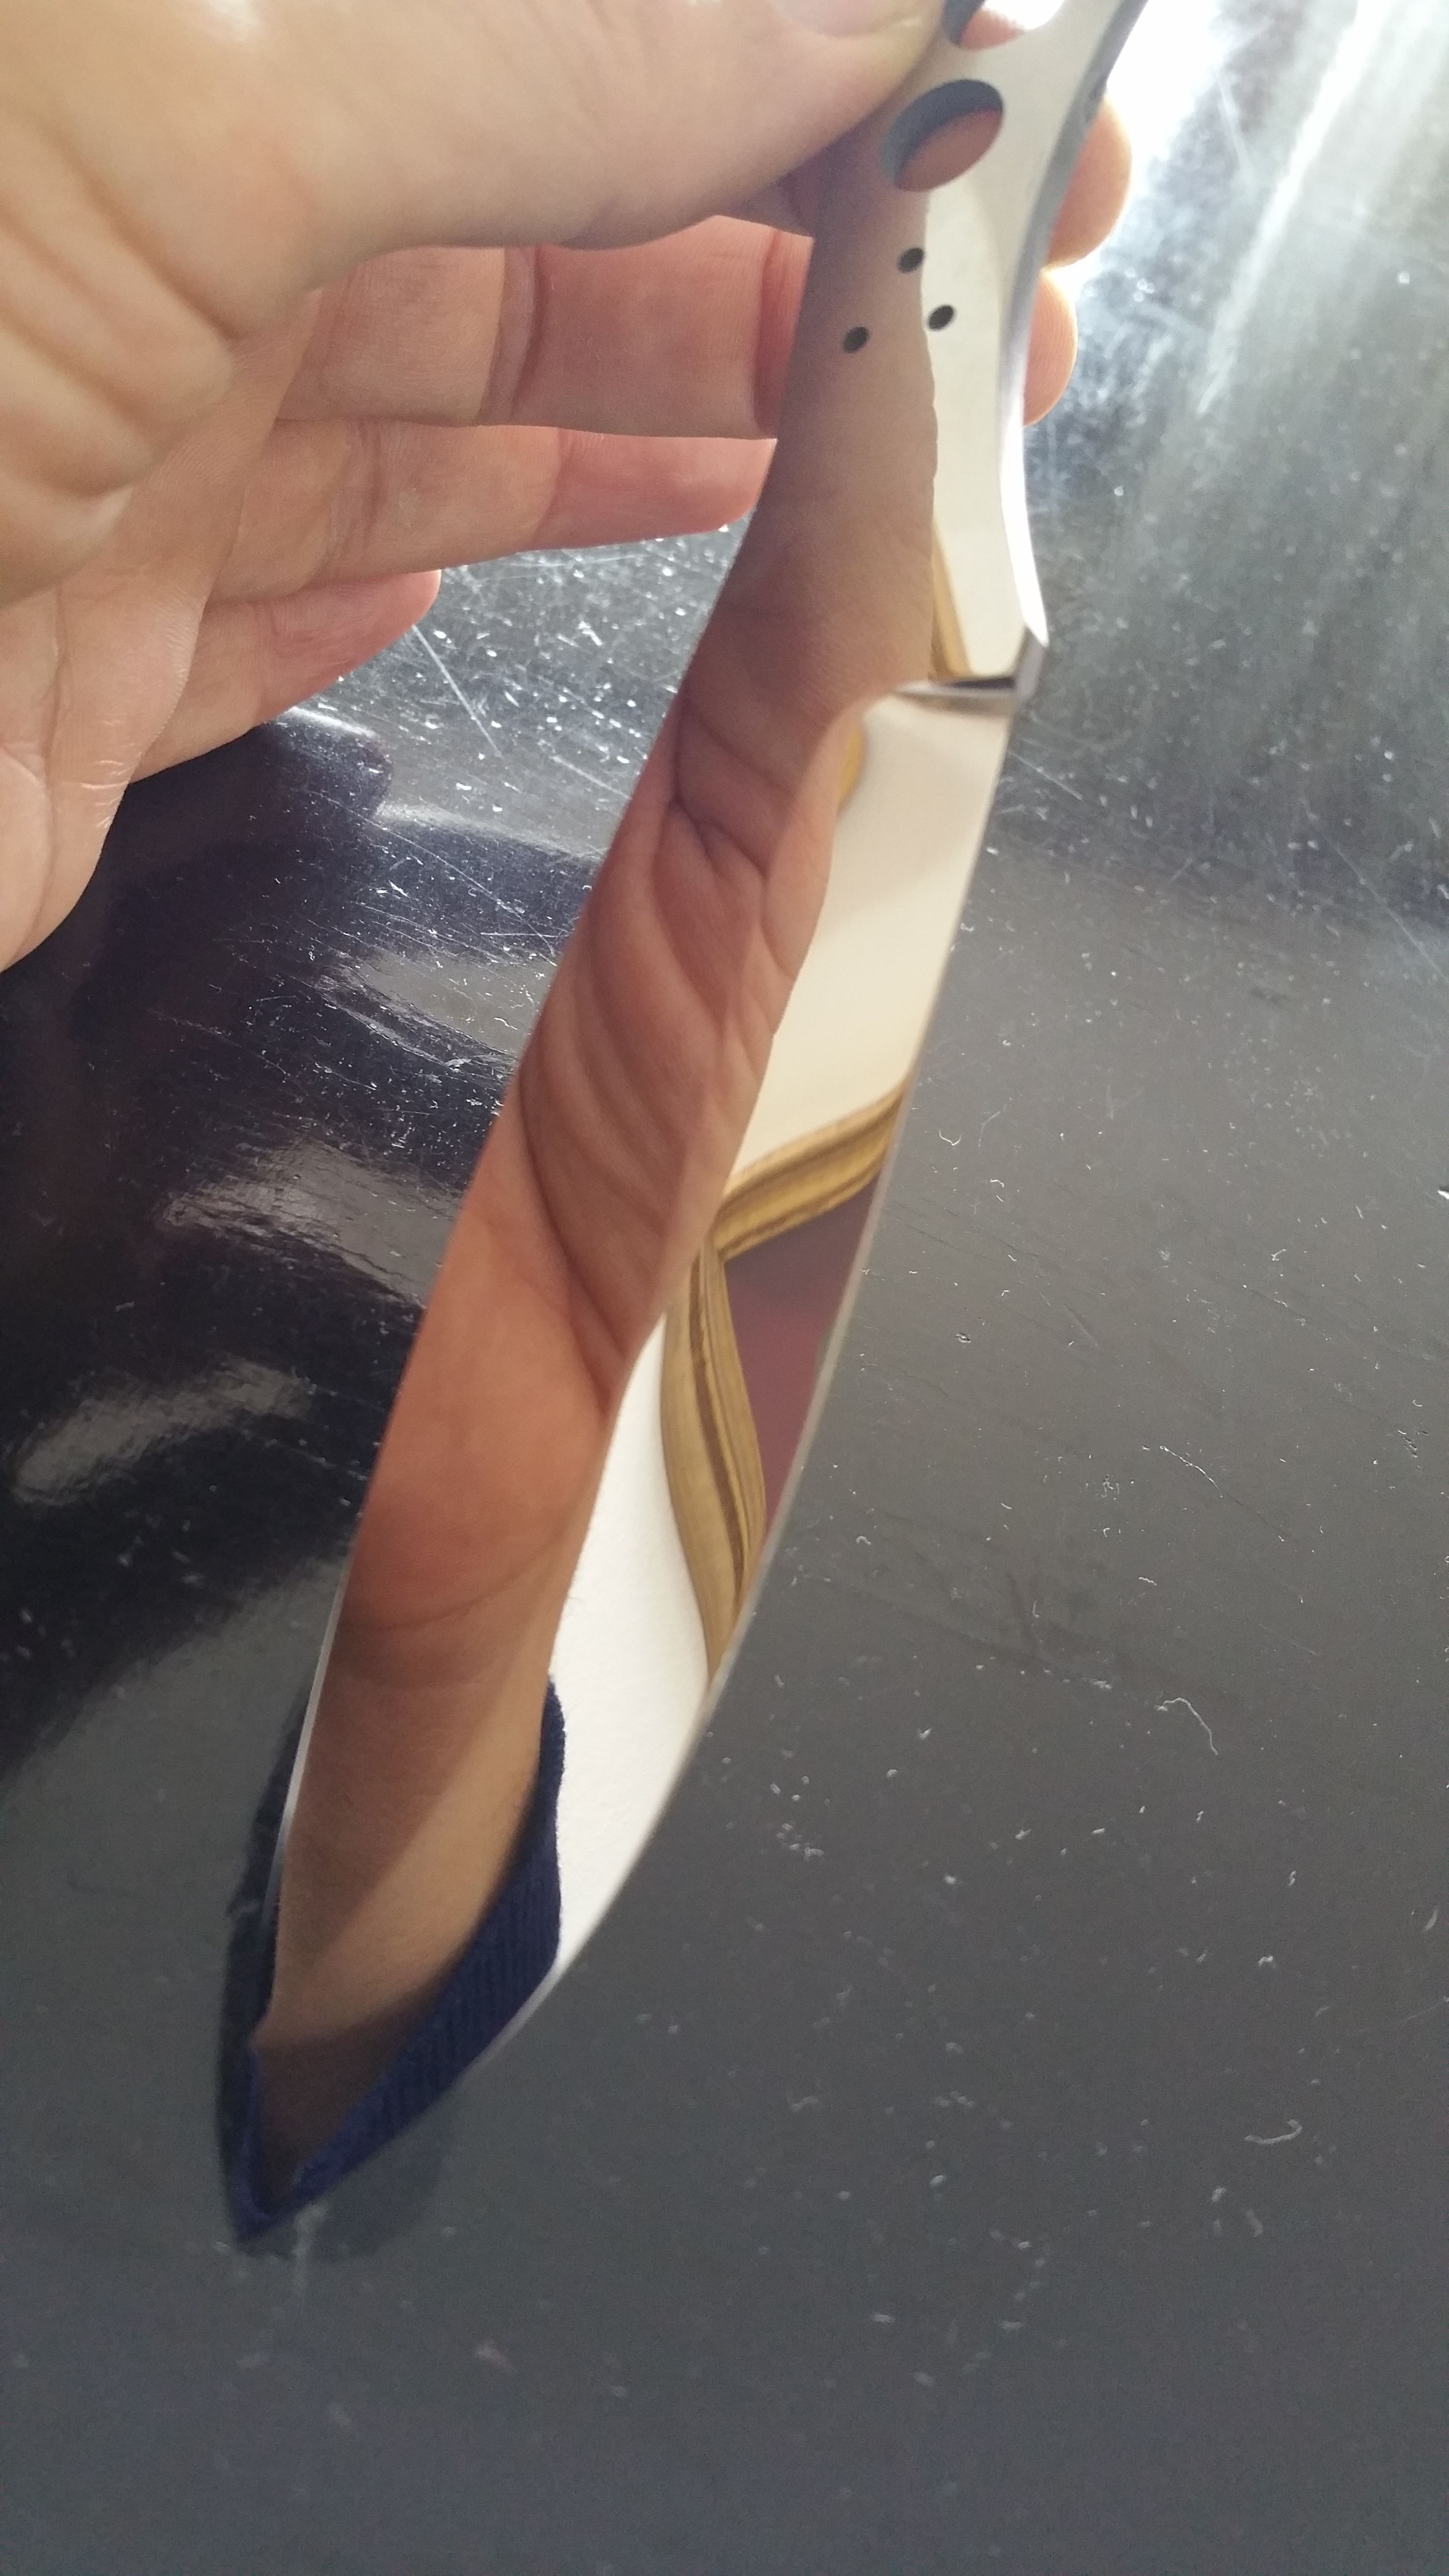 Manaresso Knives Canadian belt knife. Working on mirror